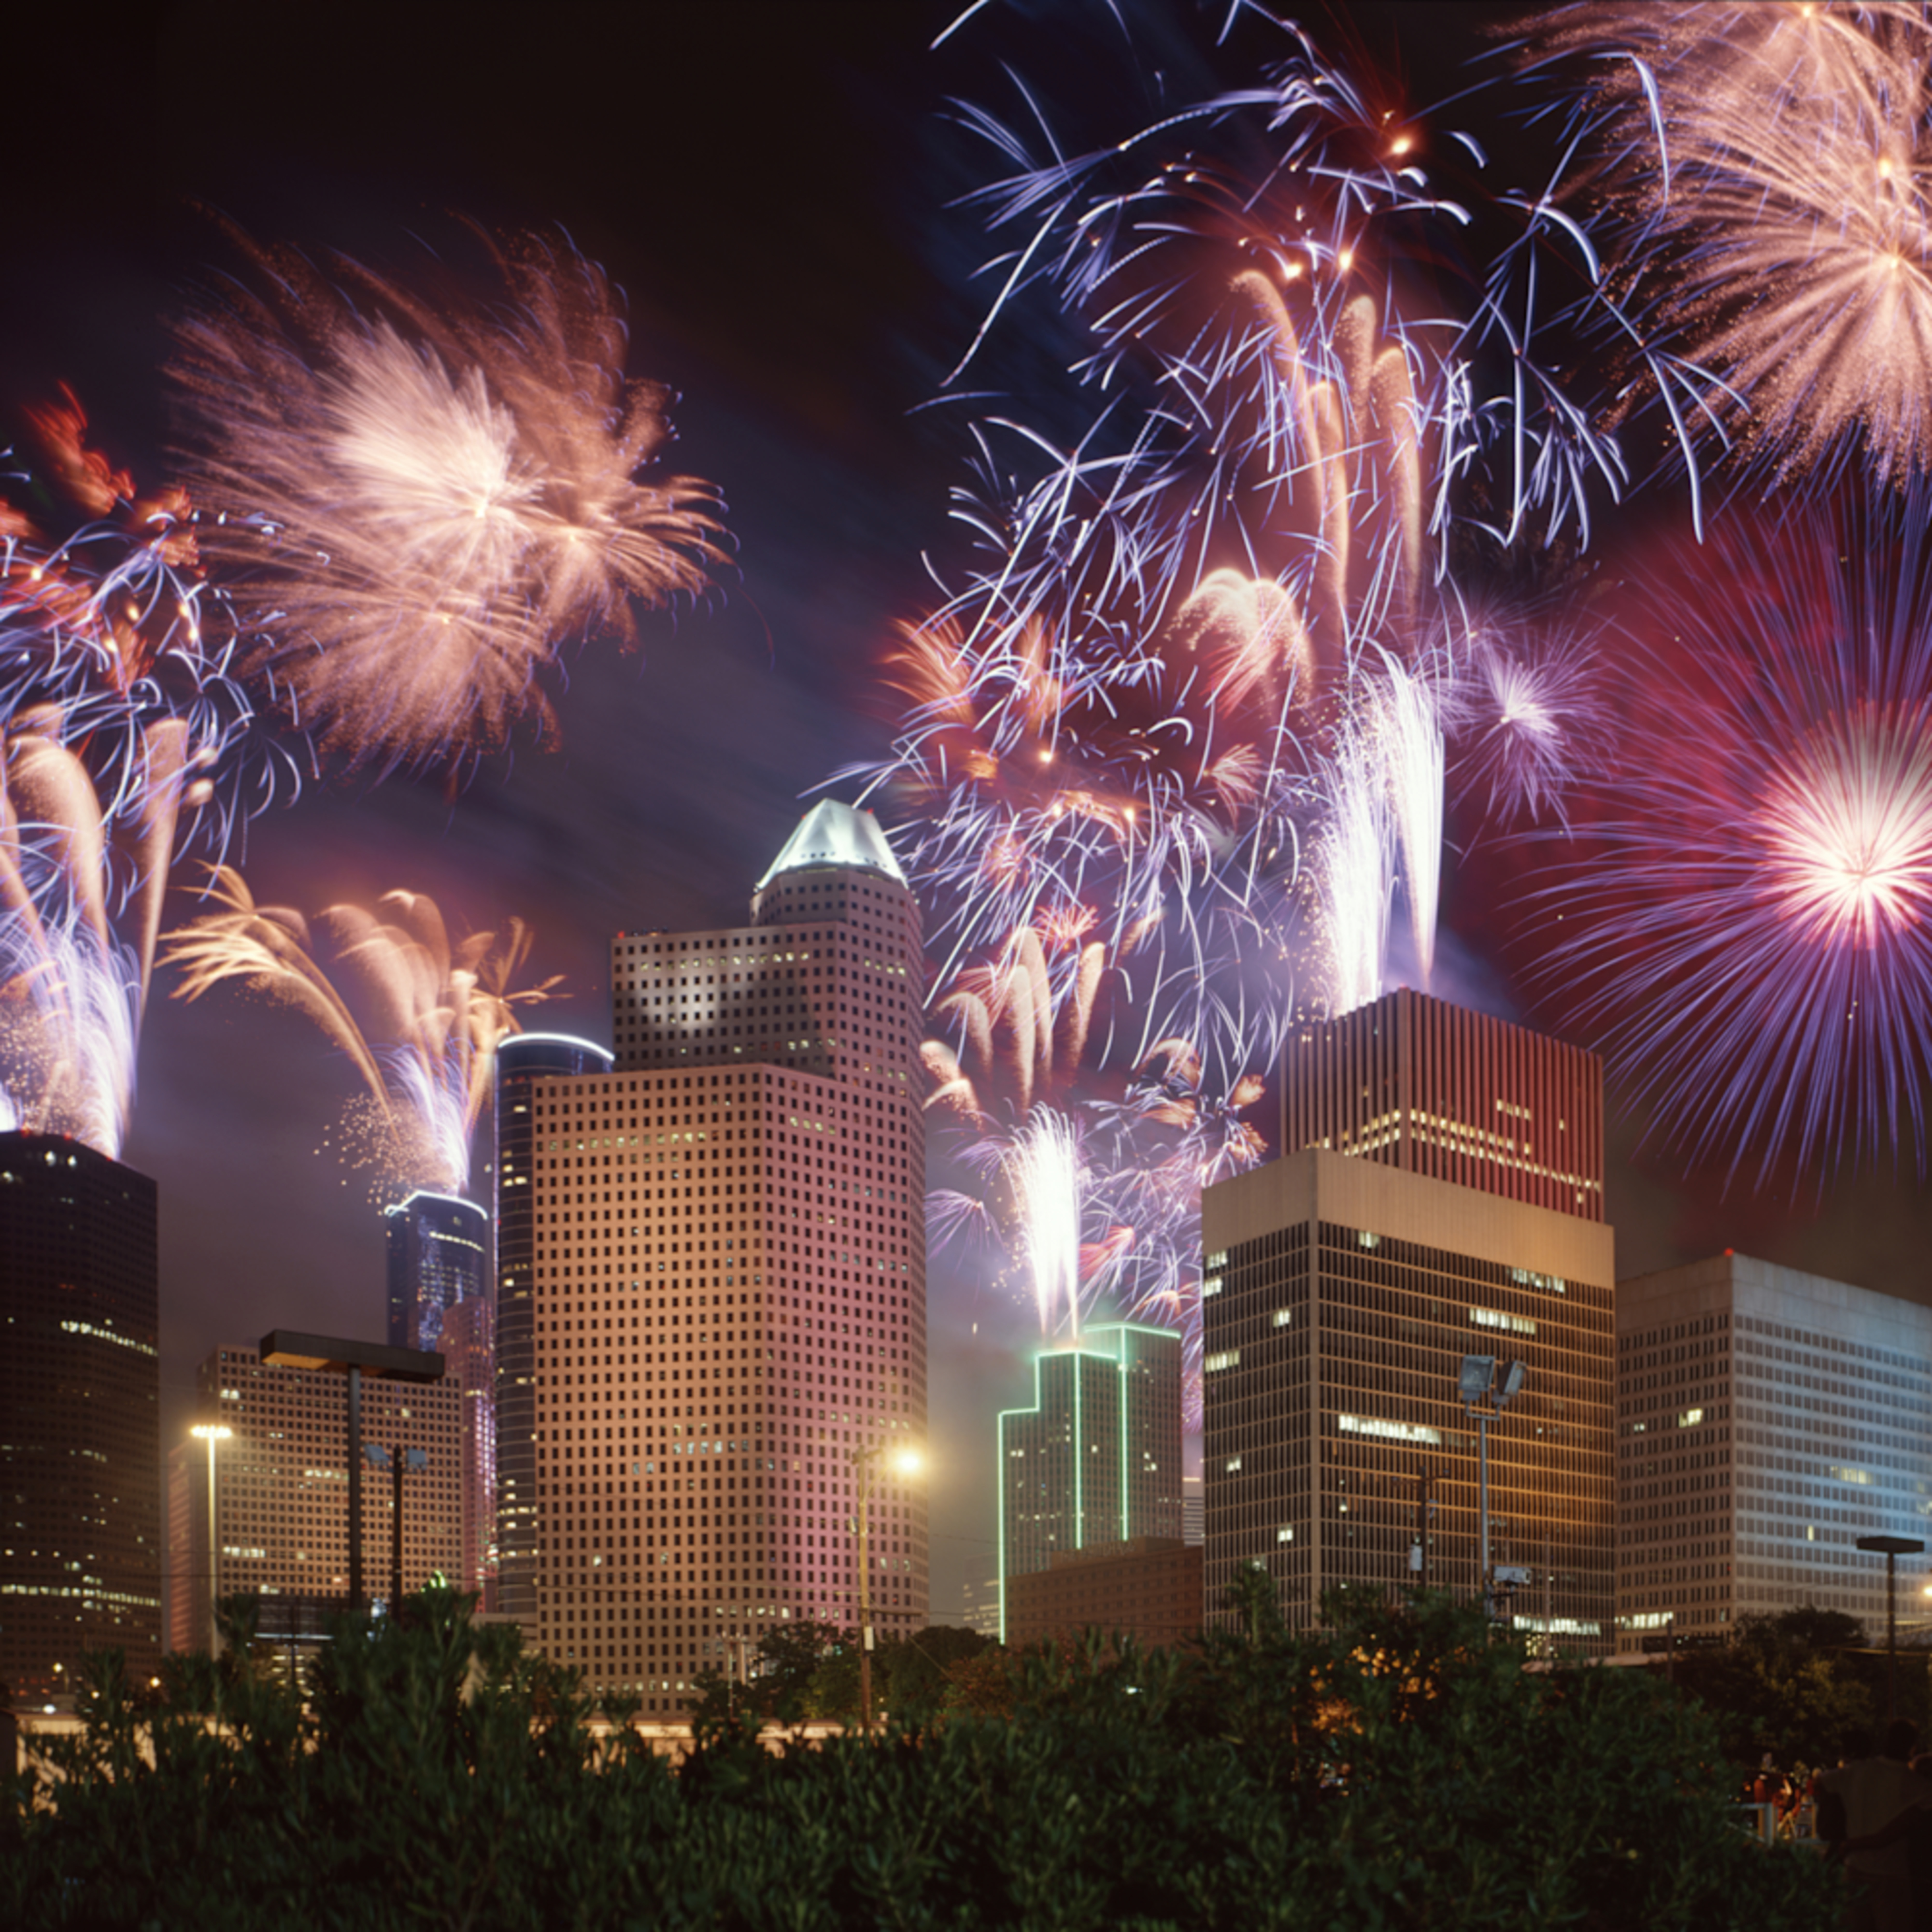 Fireworks 1997 039 ozcvjq